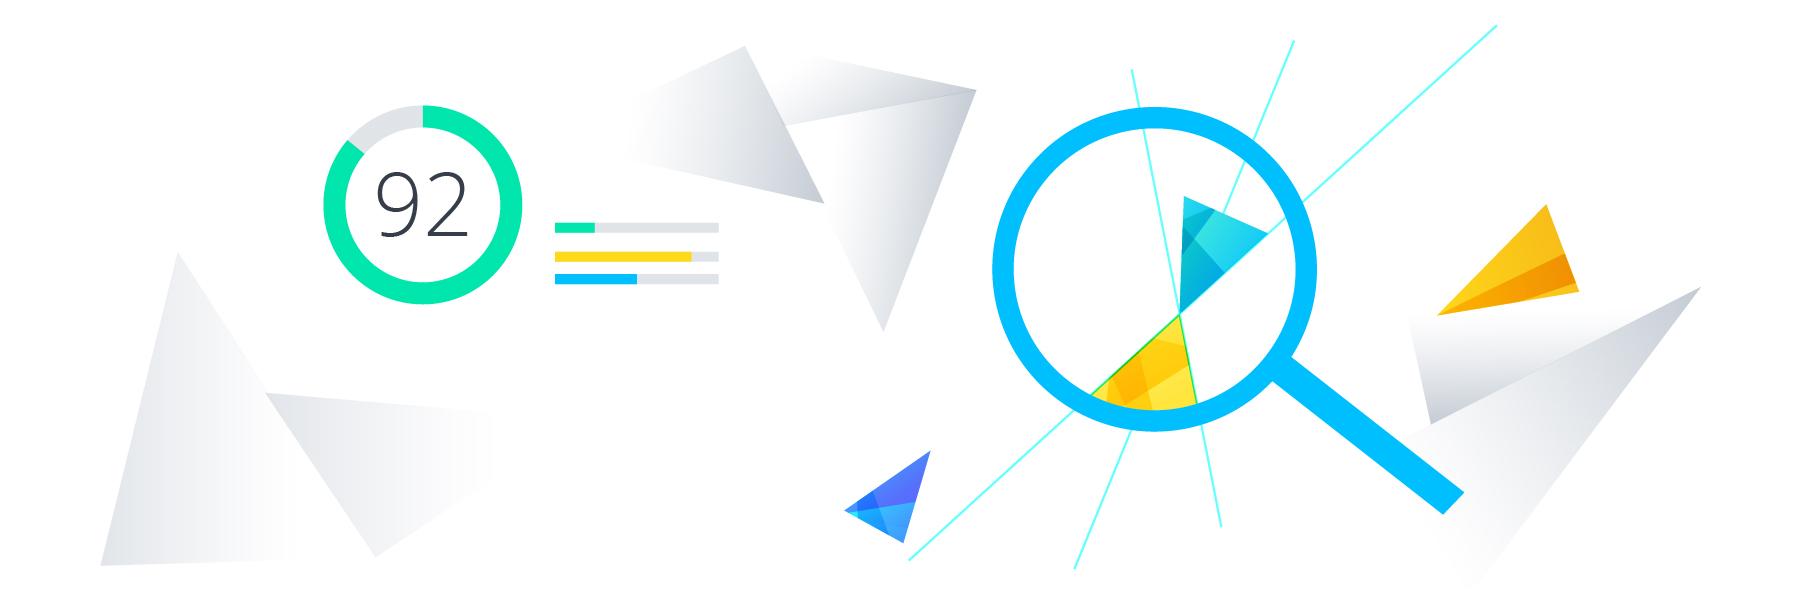 (Re) Building a Ransomware Risk Score for the Future